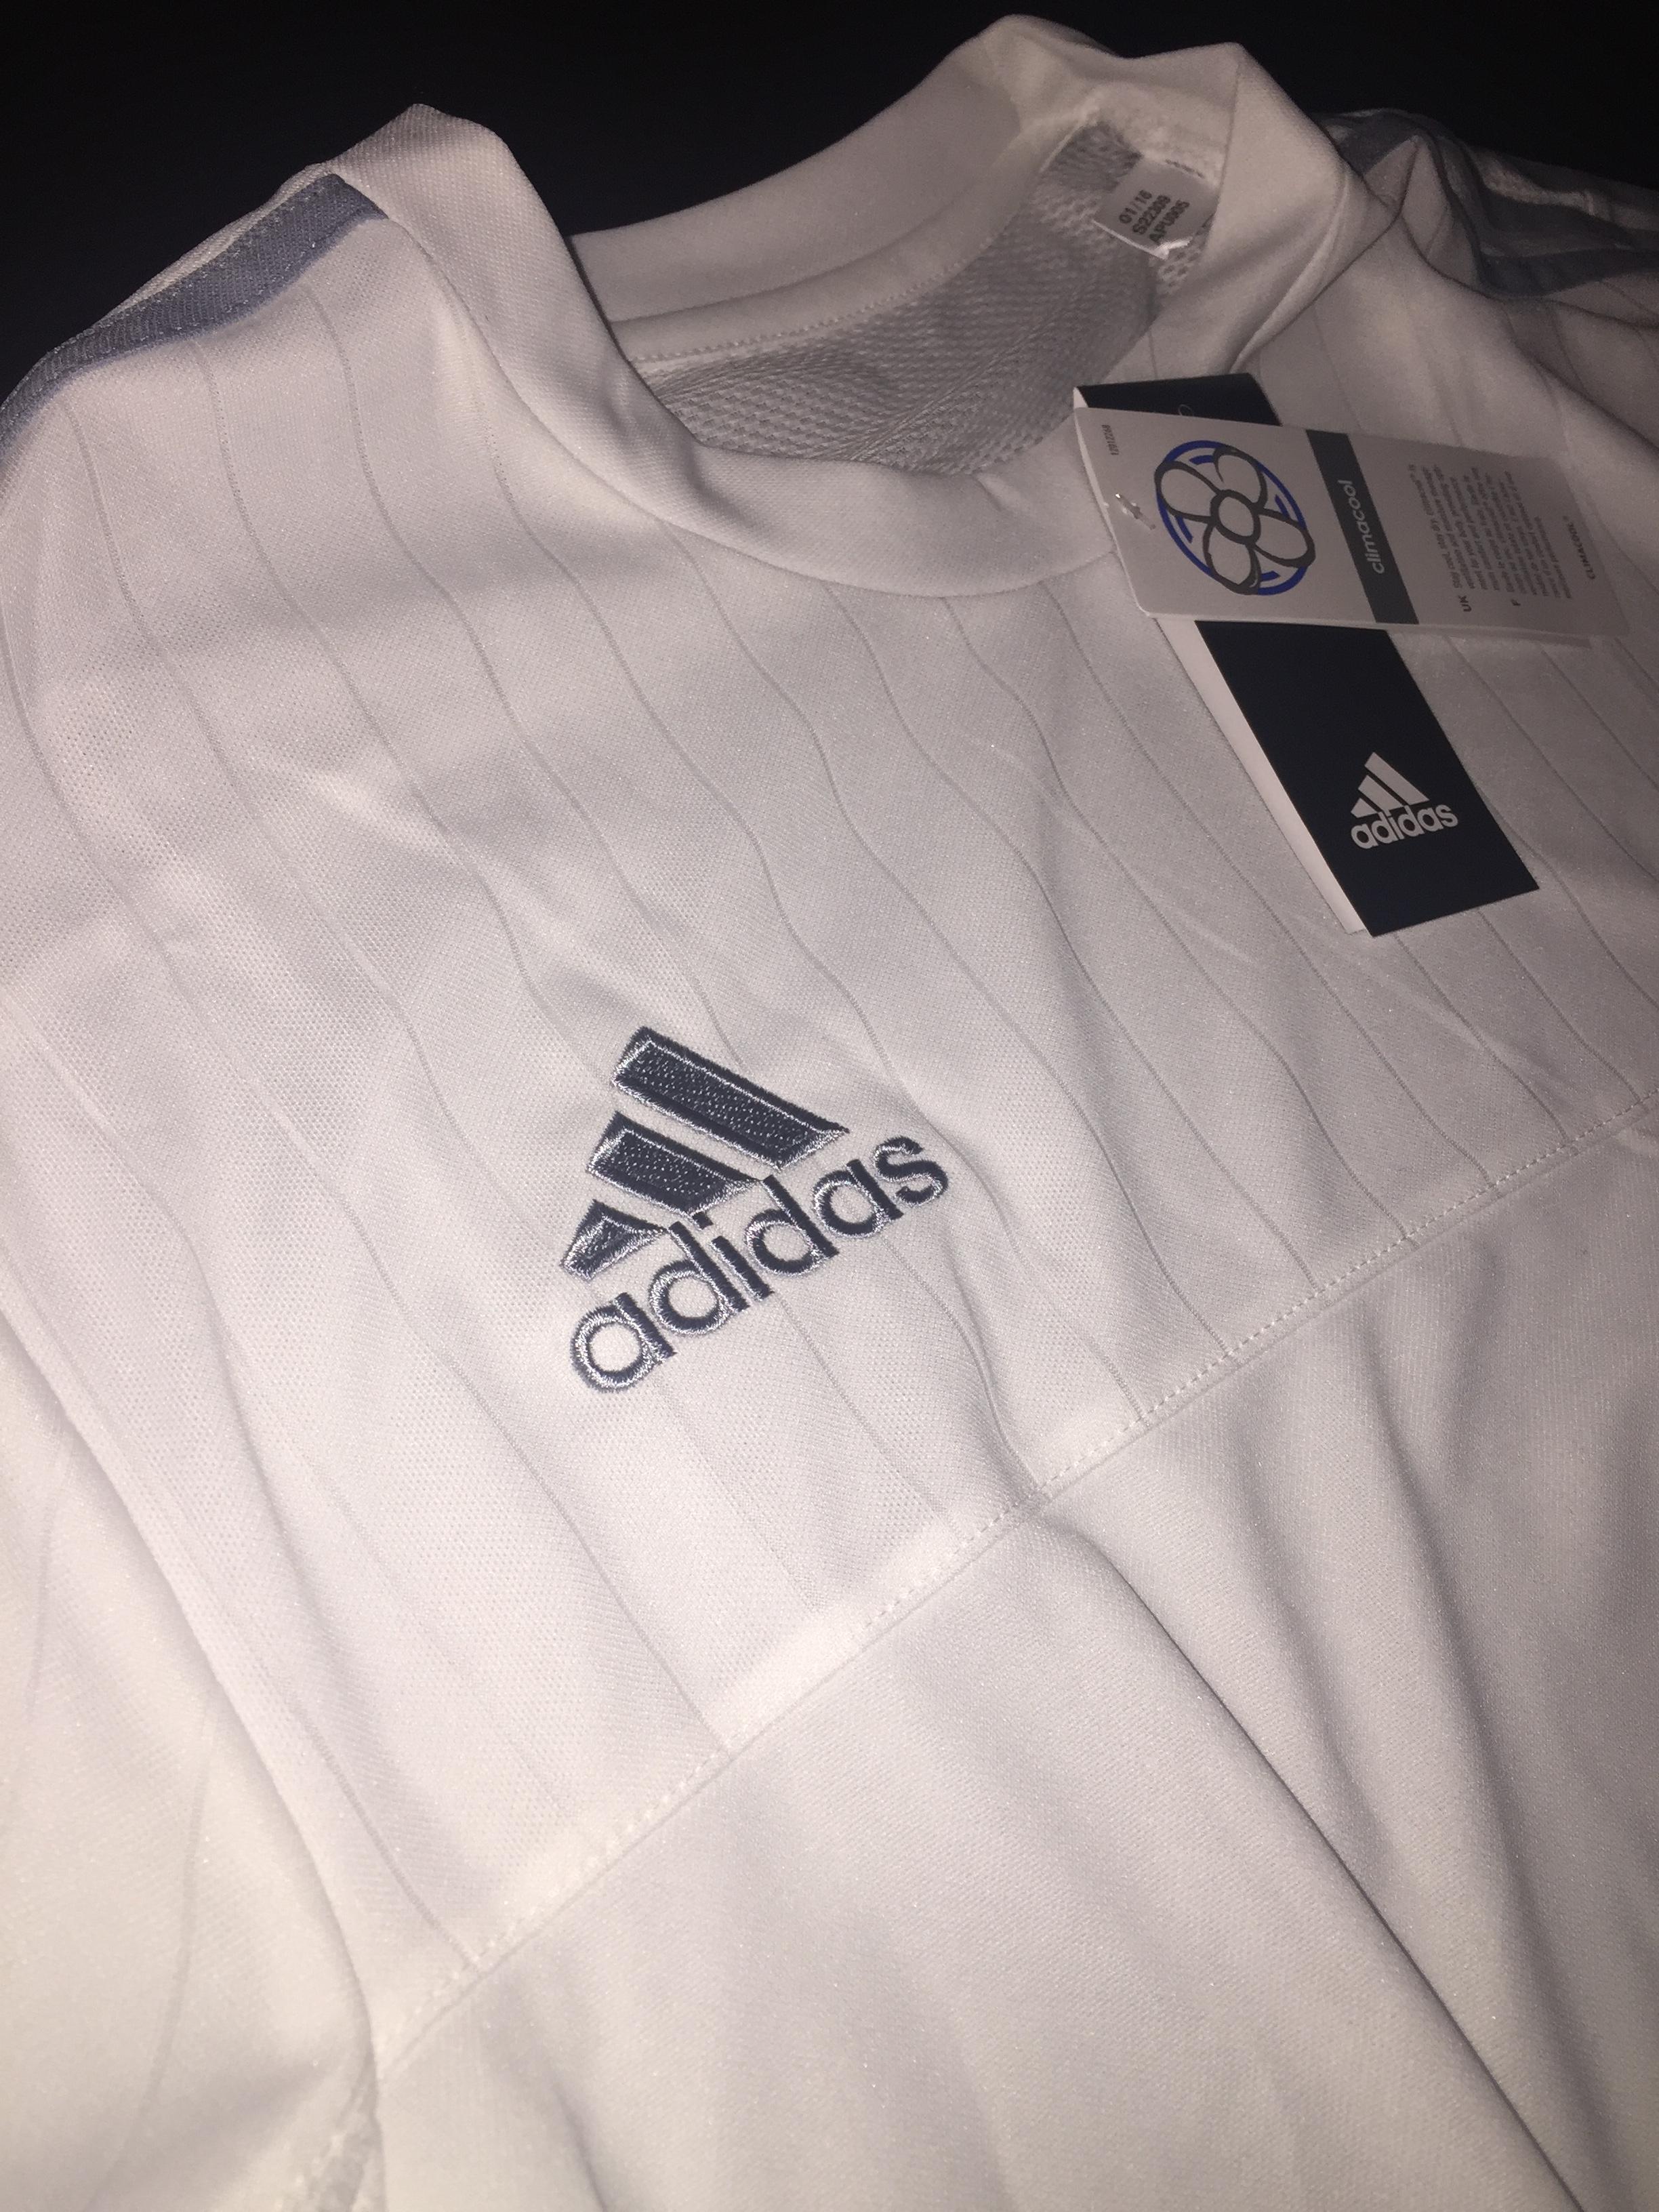 T-shirt d'entrainement Adidas - ClimaCool, AdiZero (Adidas Aubergenville 78)